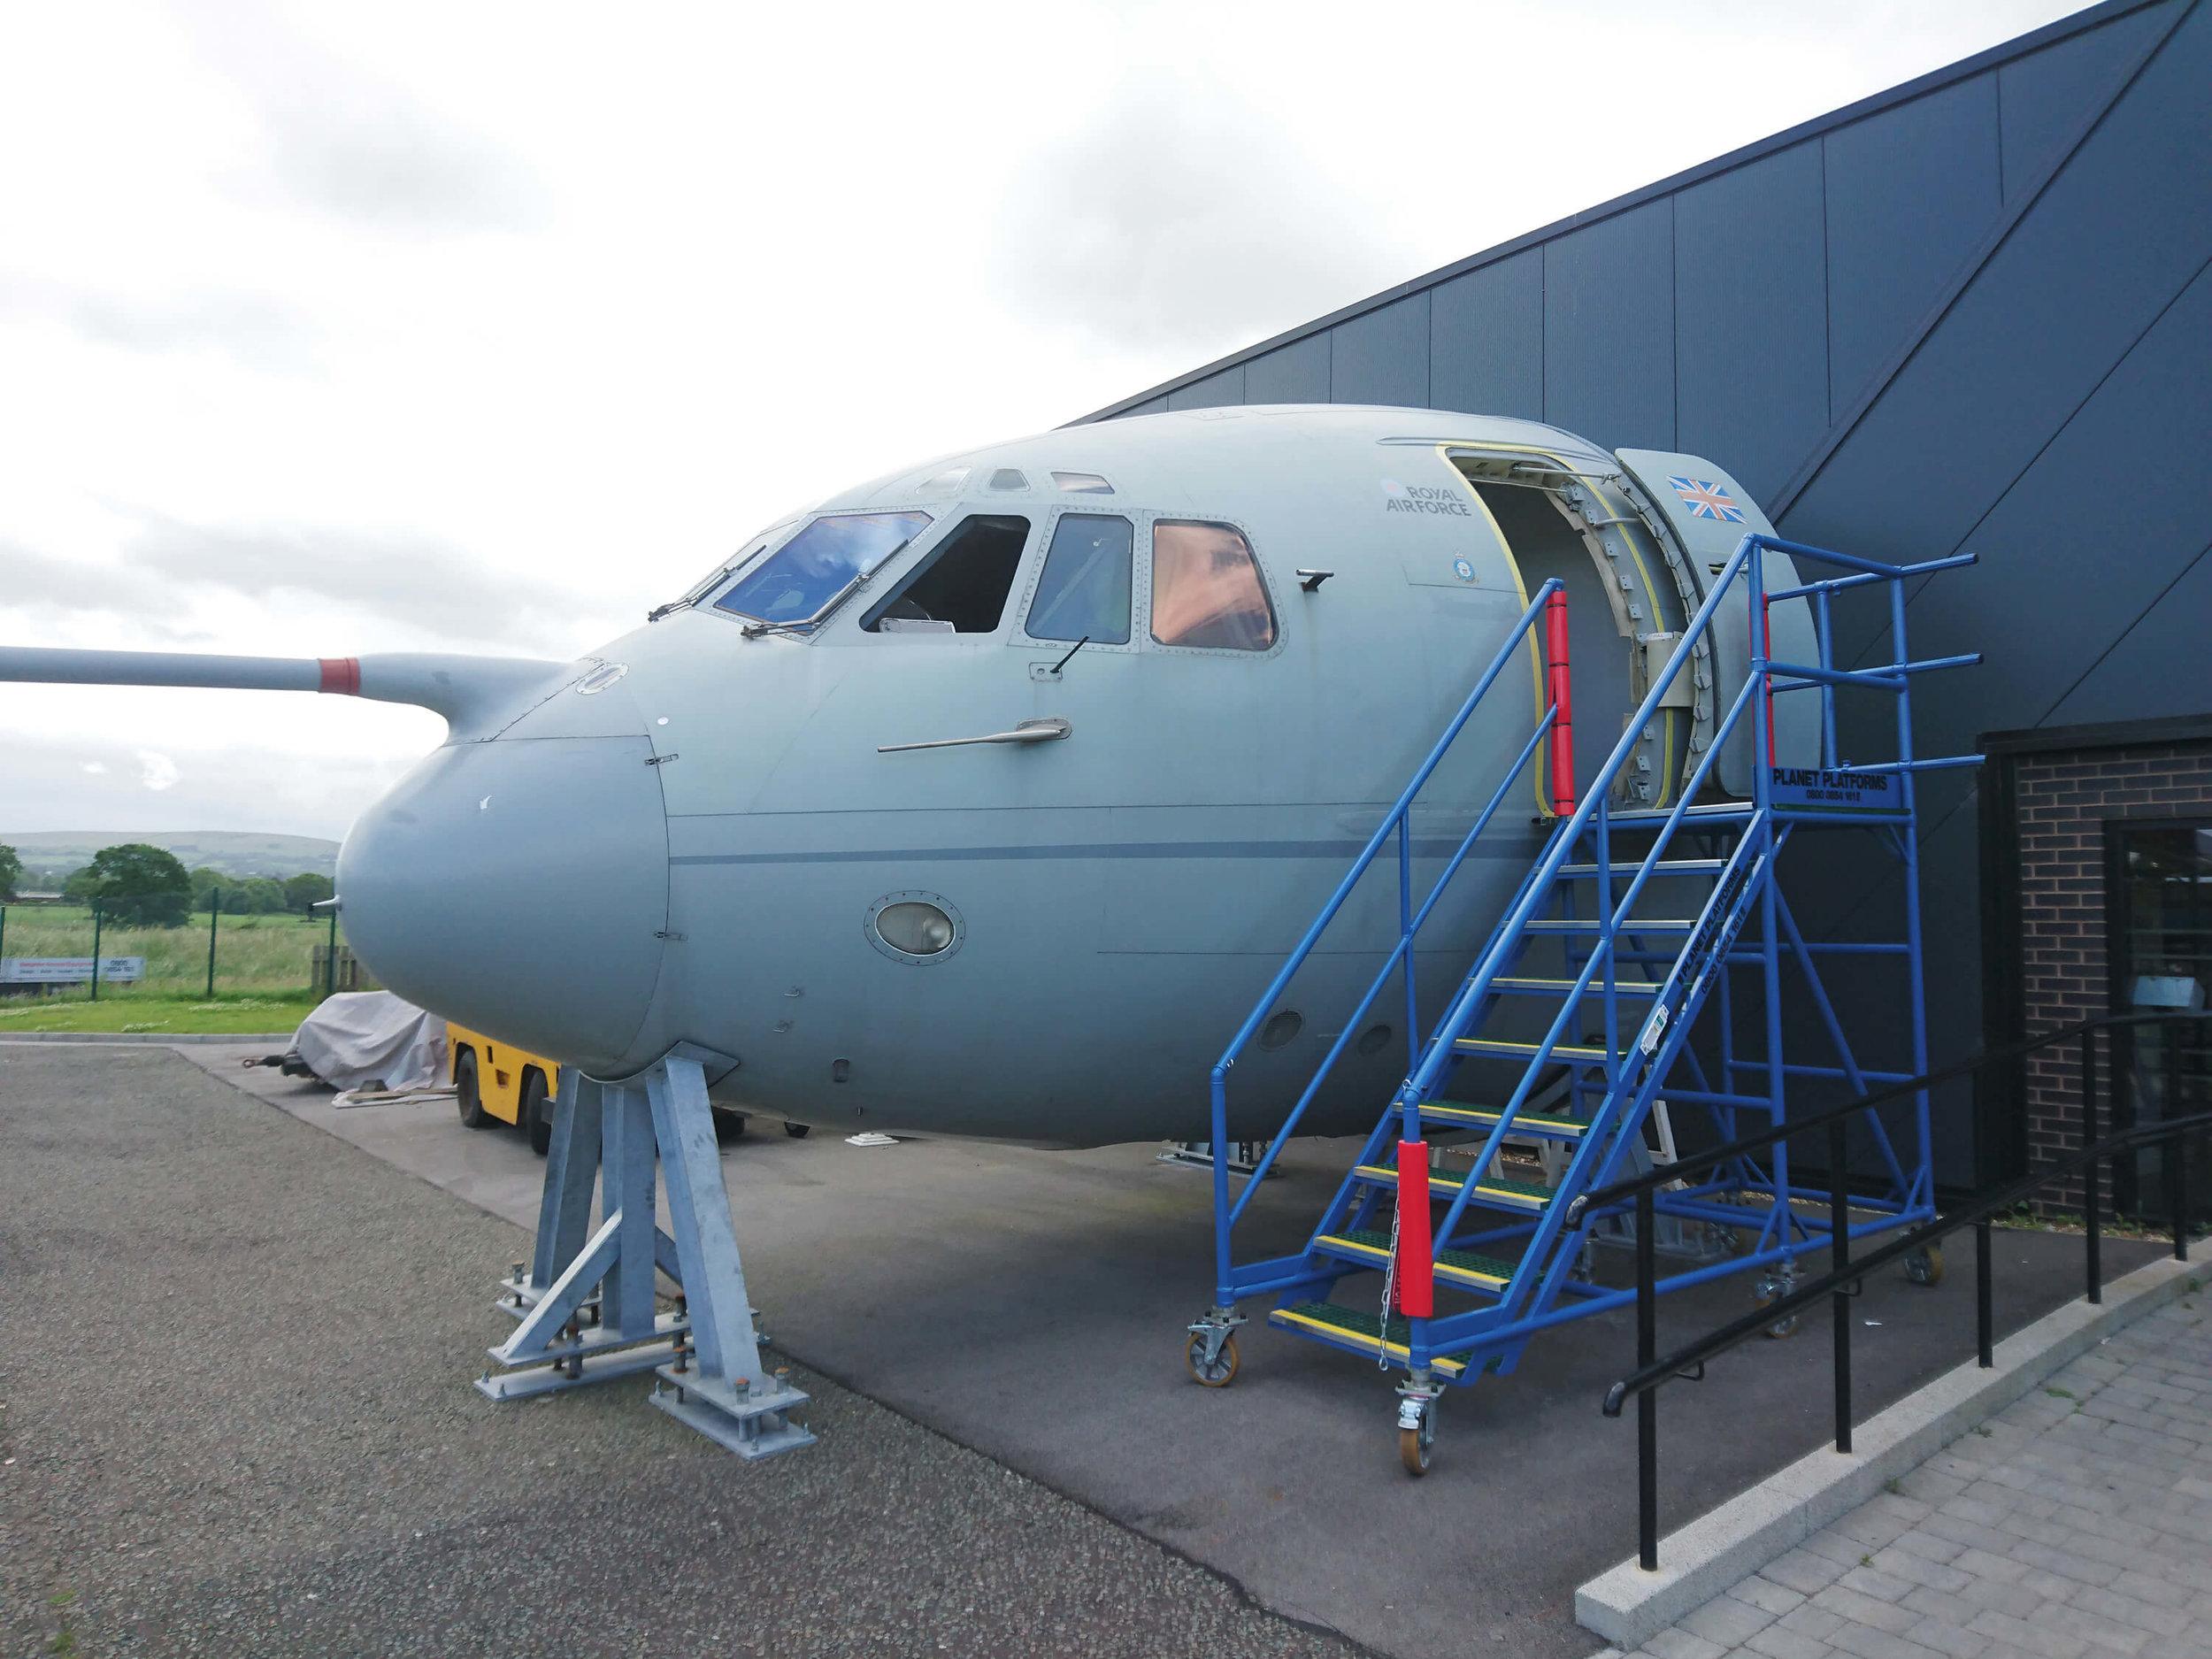 Planet Platforms Avro